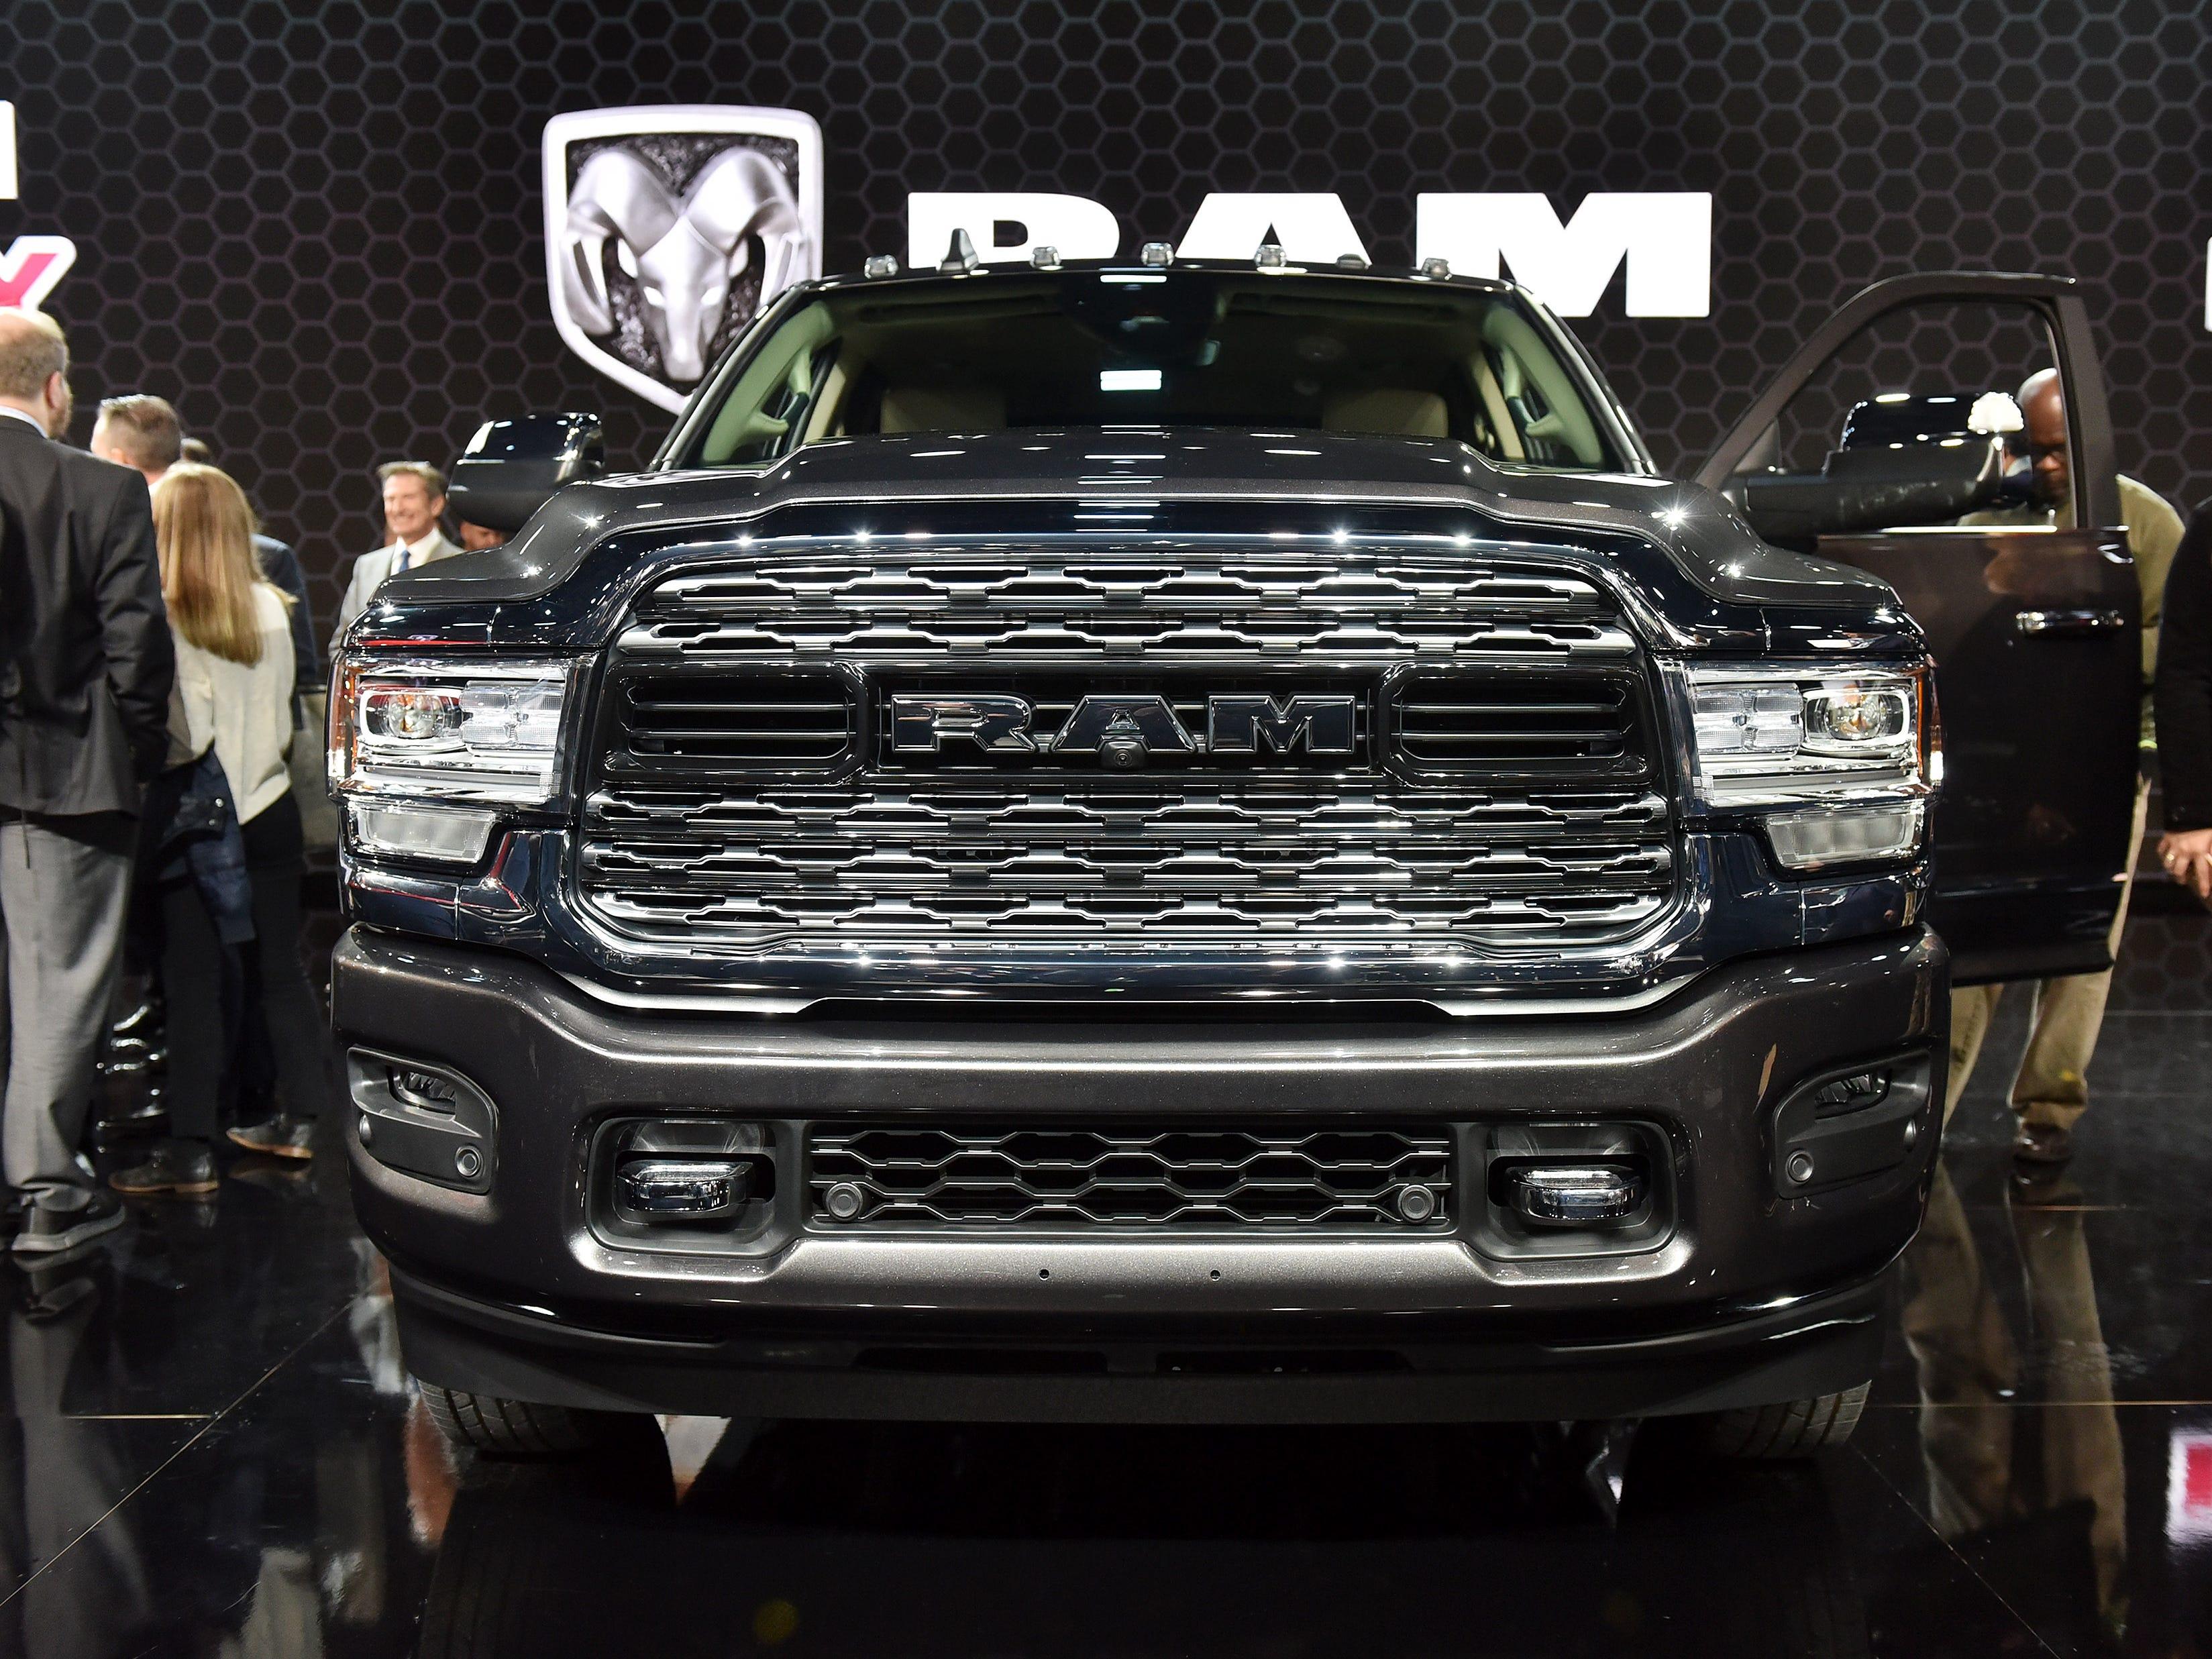 The 2019 Ram Heavy Duty 3500.